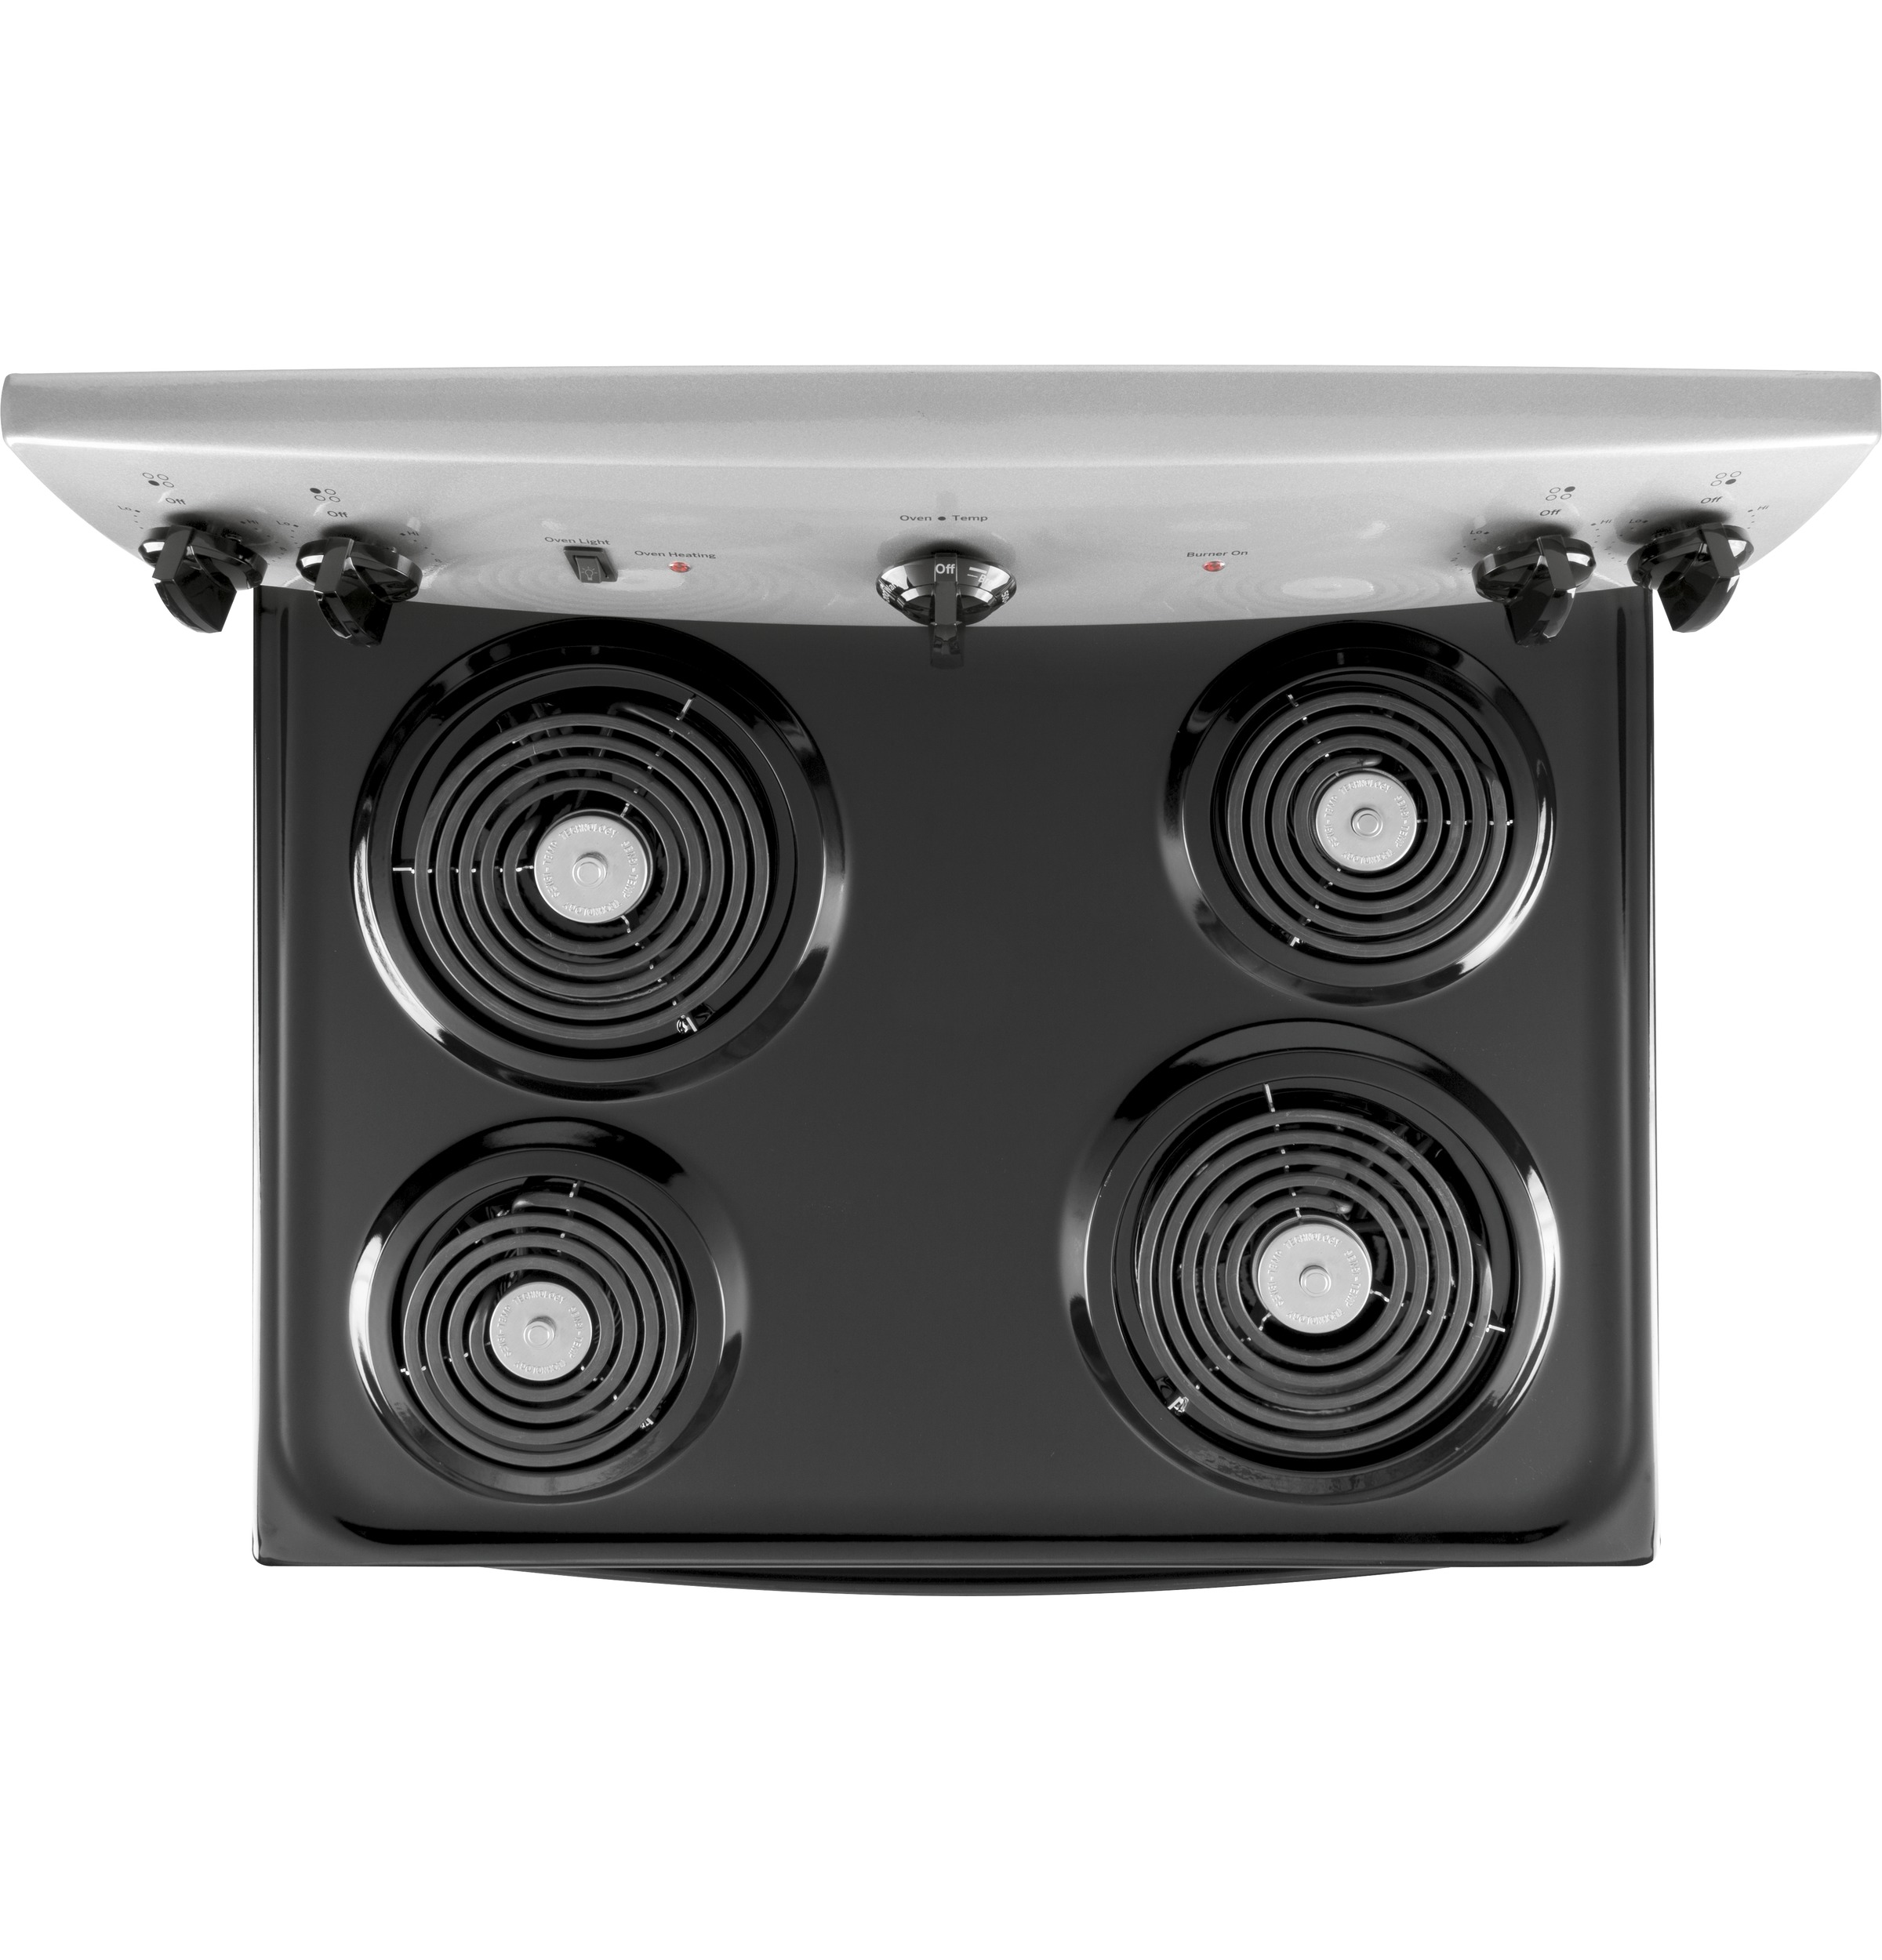 "Model: JBS160GMSA | GE GE® 30"" Free-Standing Electric Range"